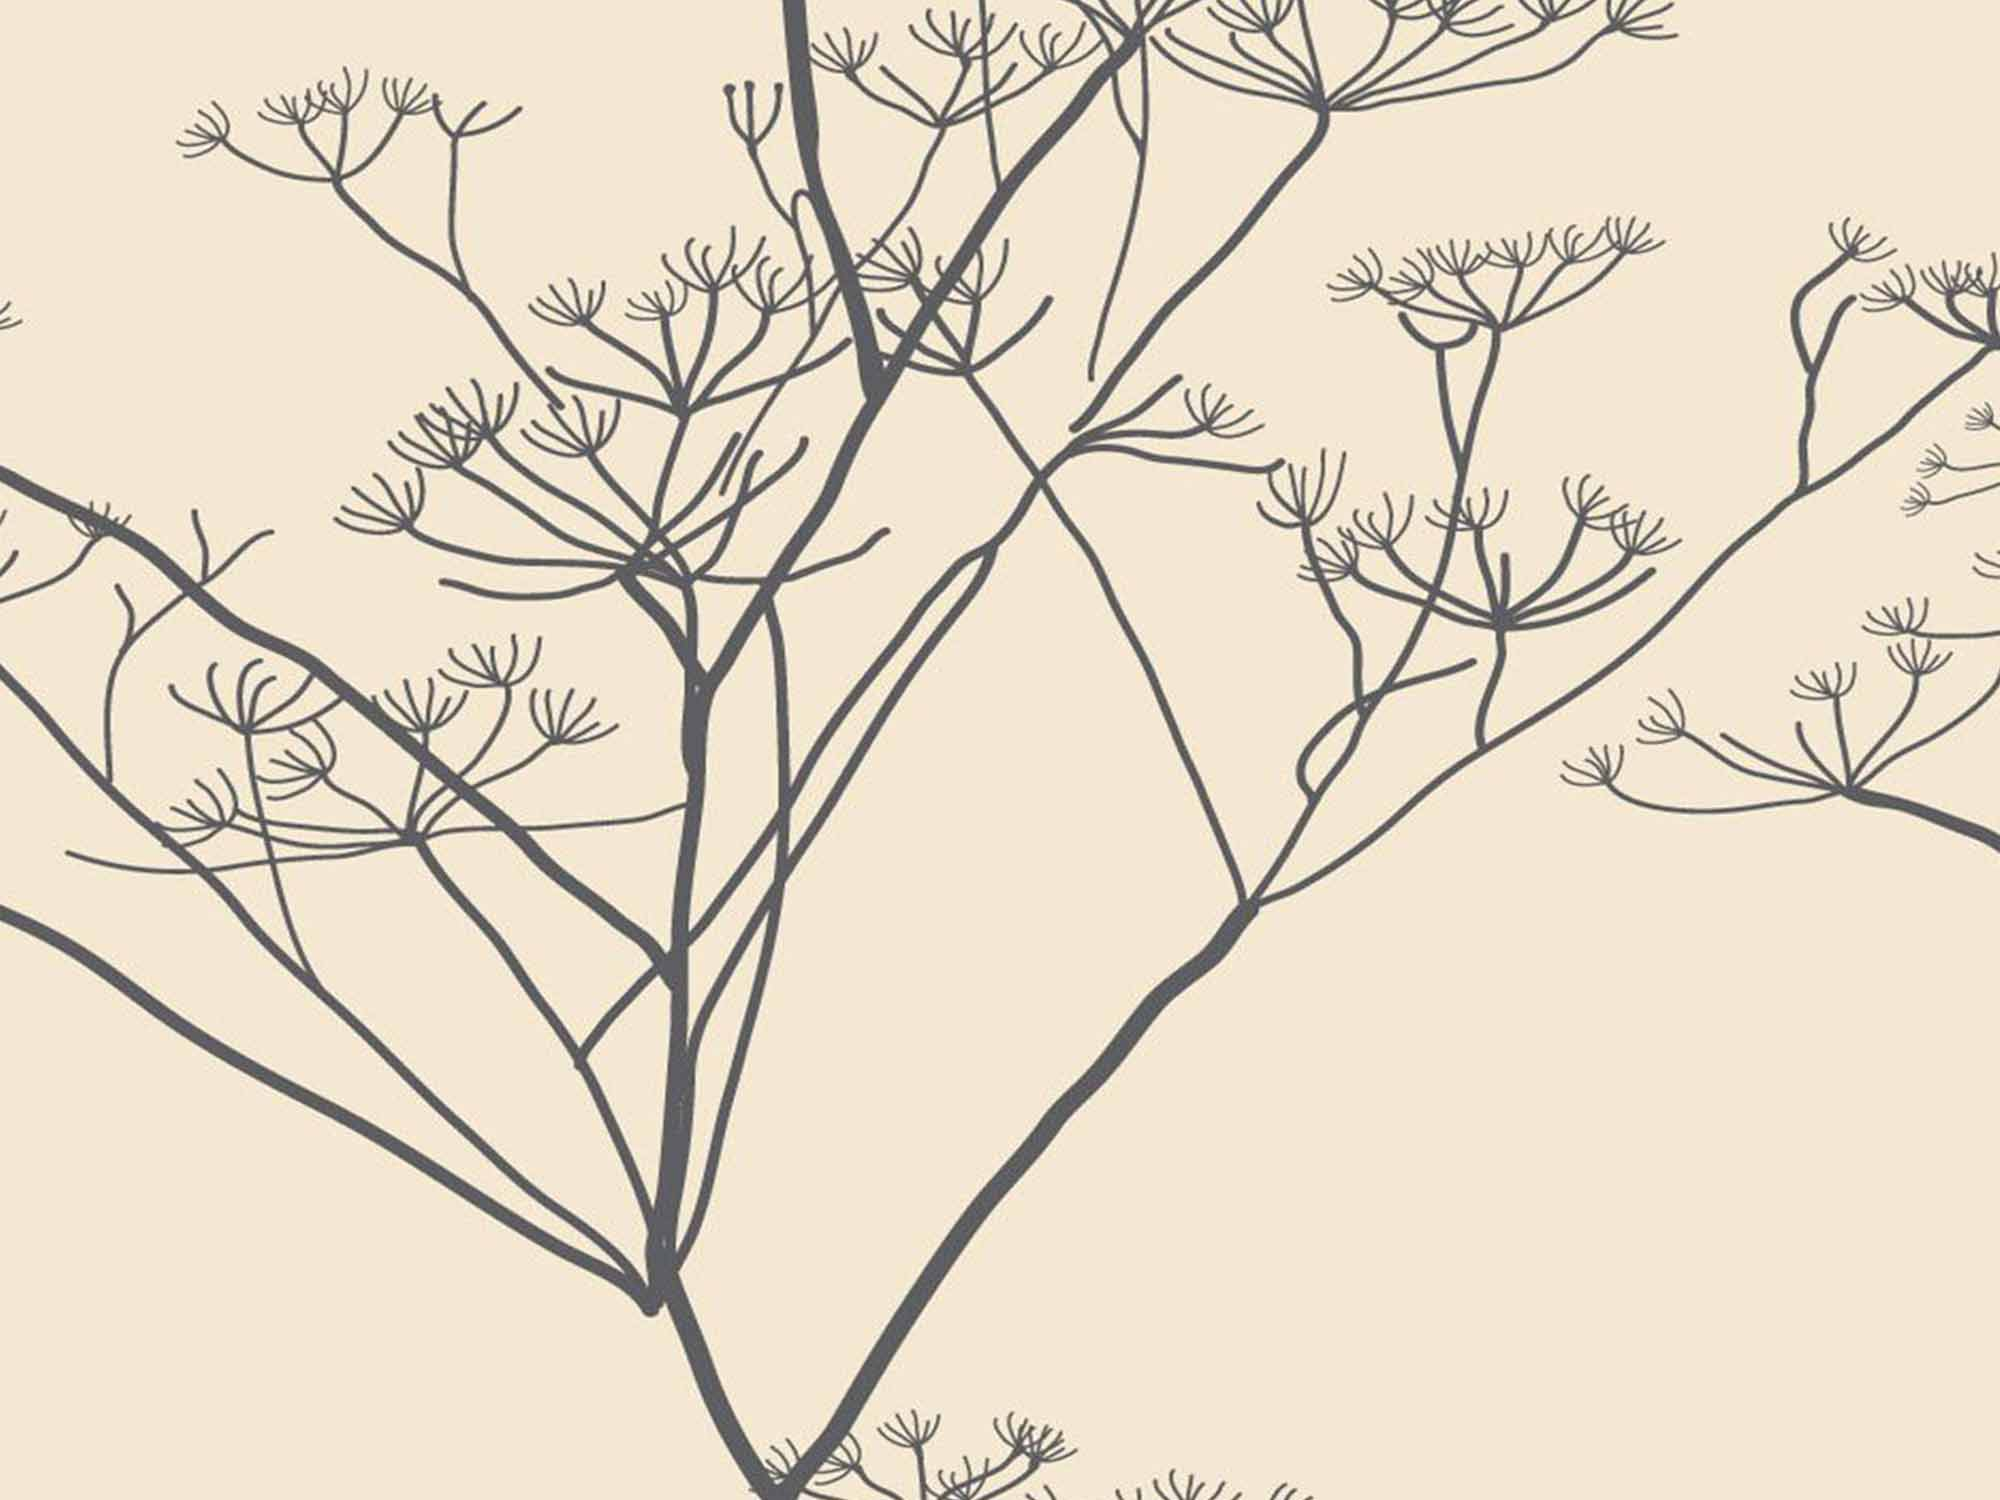 Papel de Parede Floral 0066 - Adesivos de Parede  - Paredes Decoradas